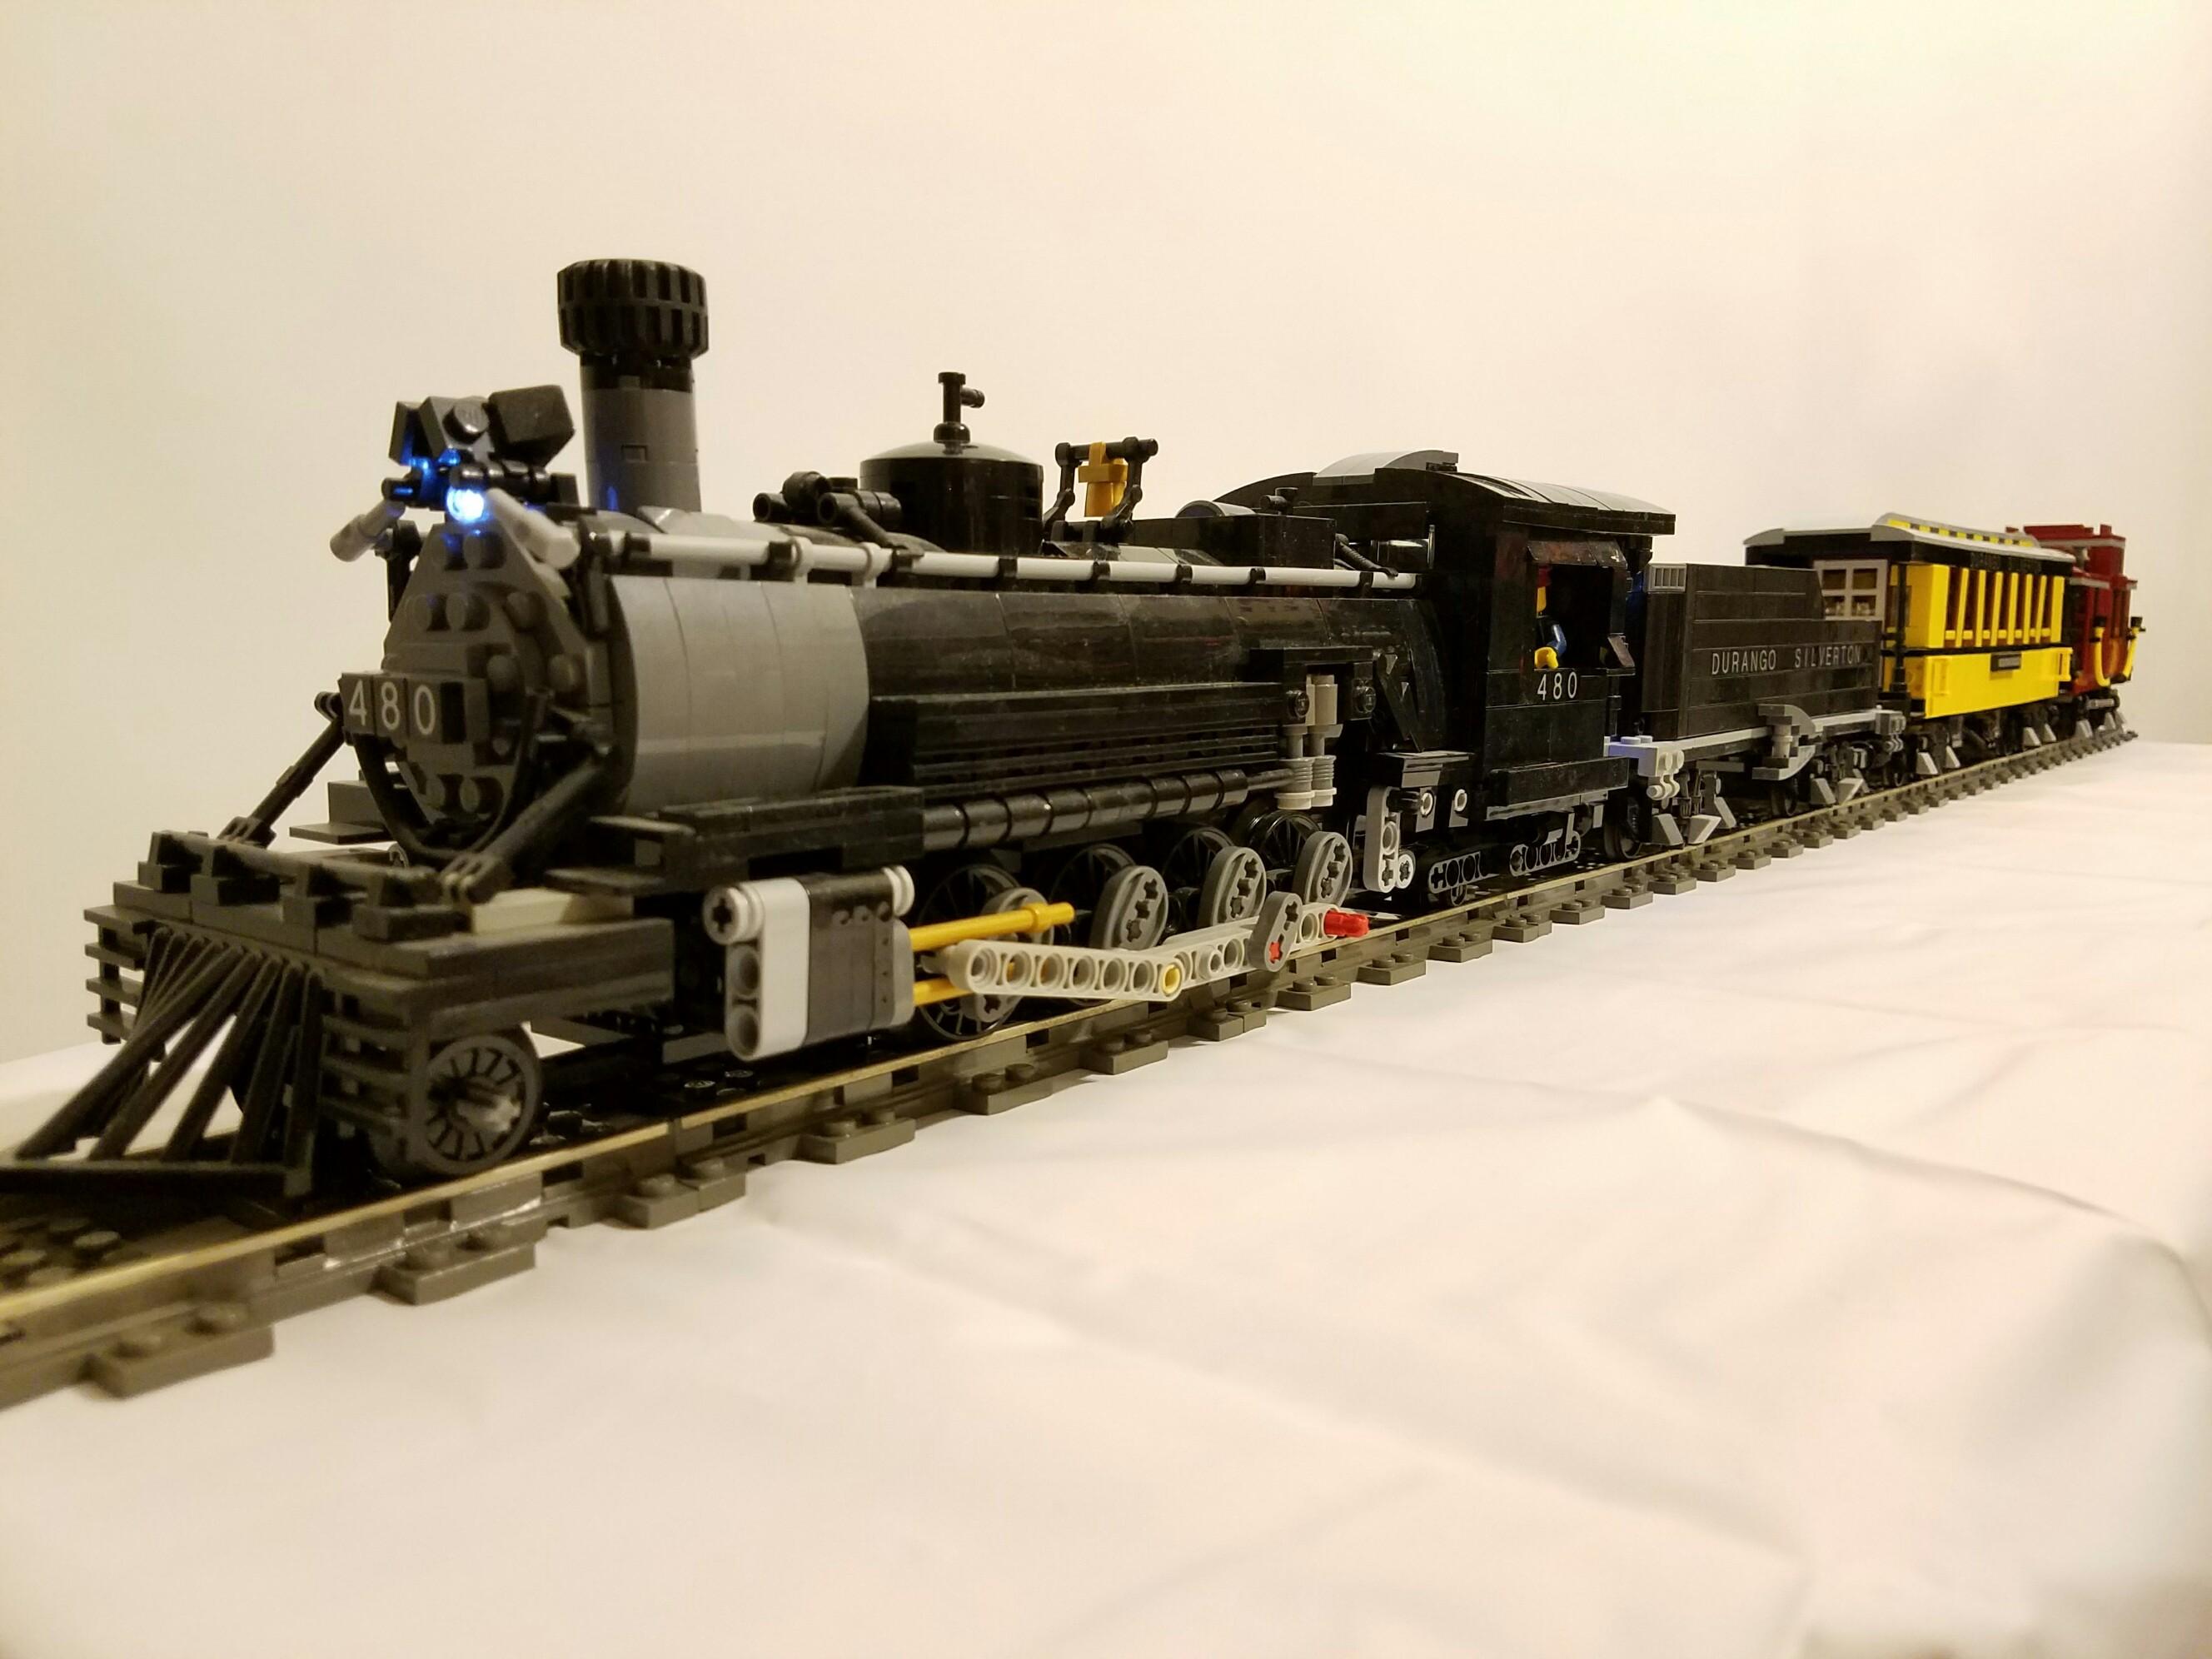 train_3-2656x1992.jpg